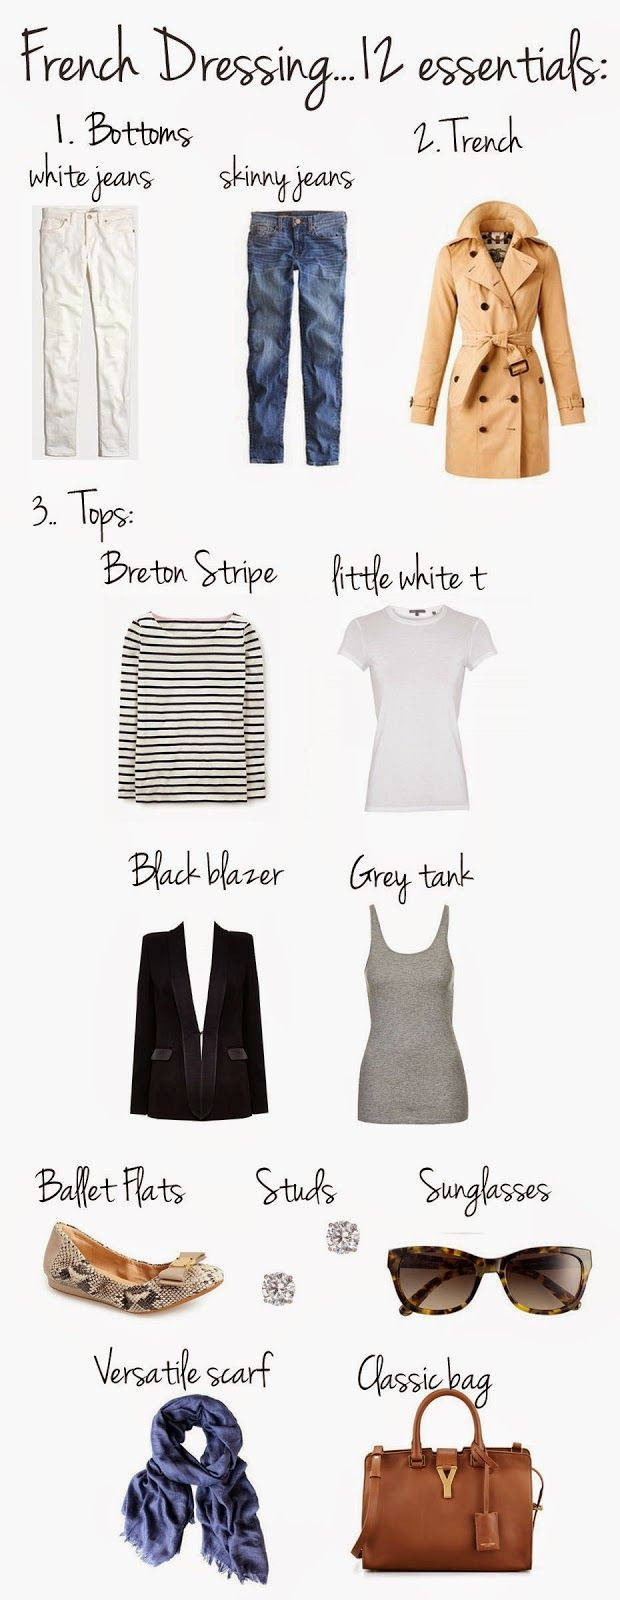 French Dressing...The twenty four essentials